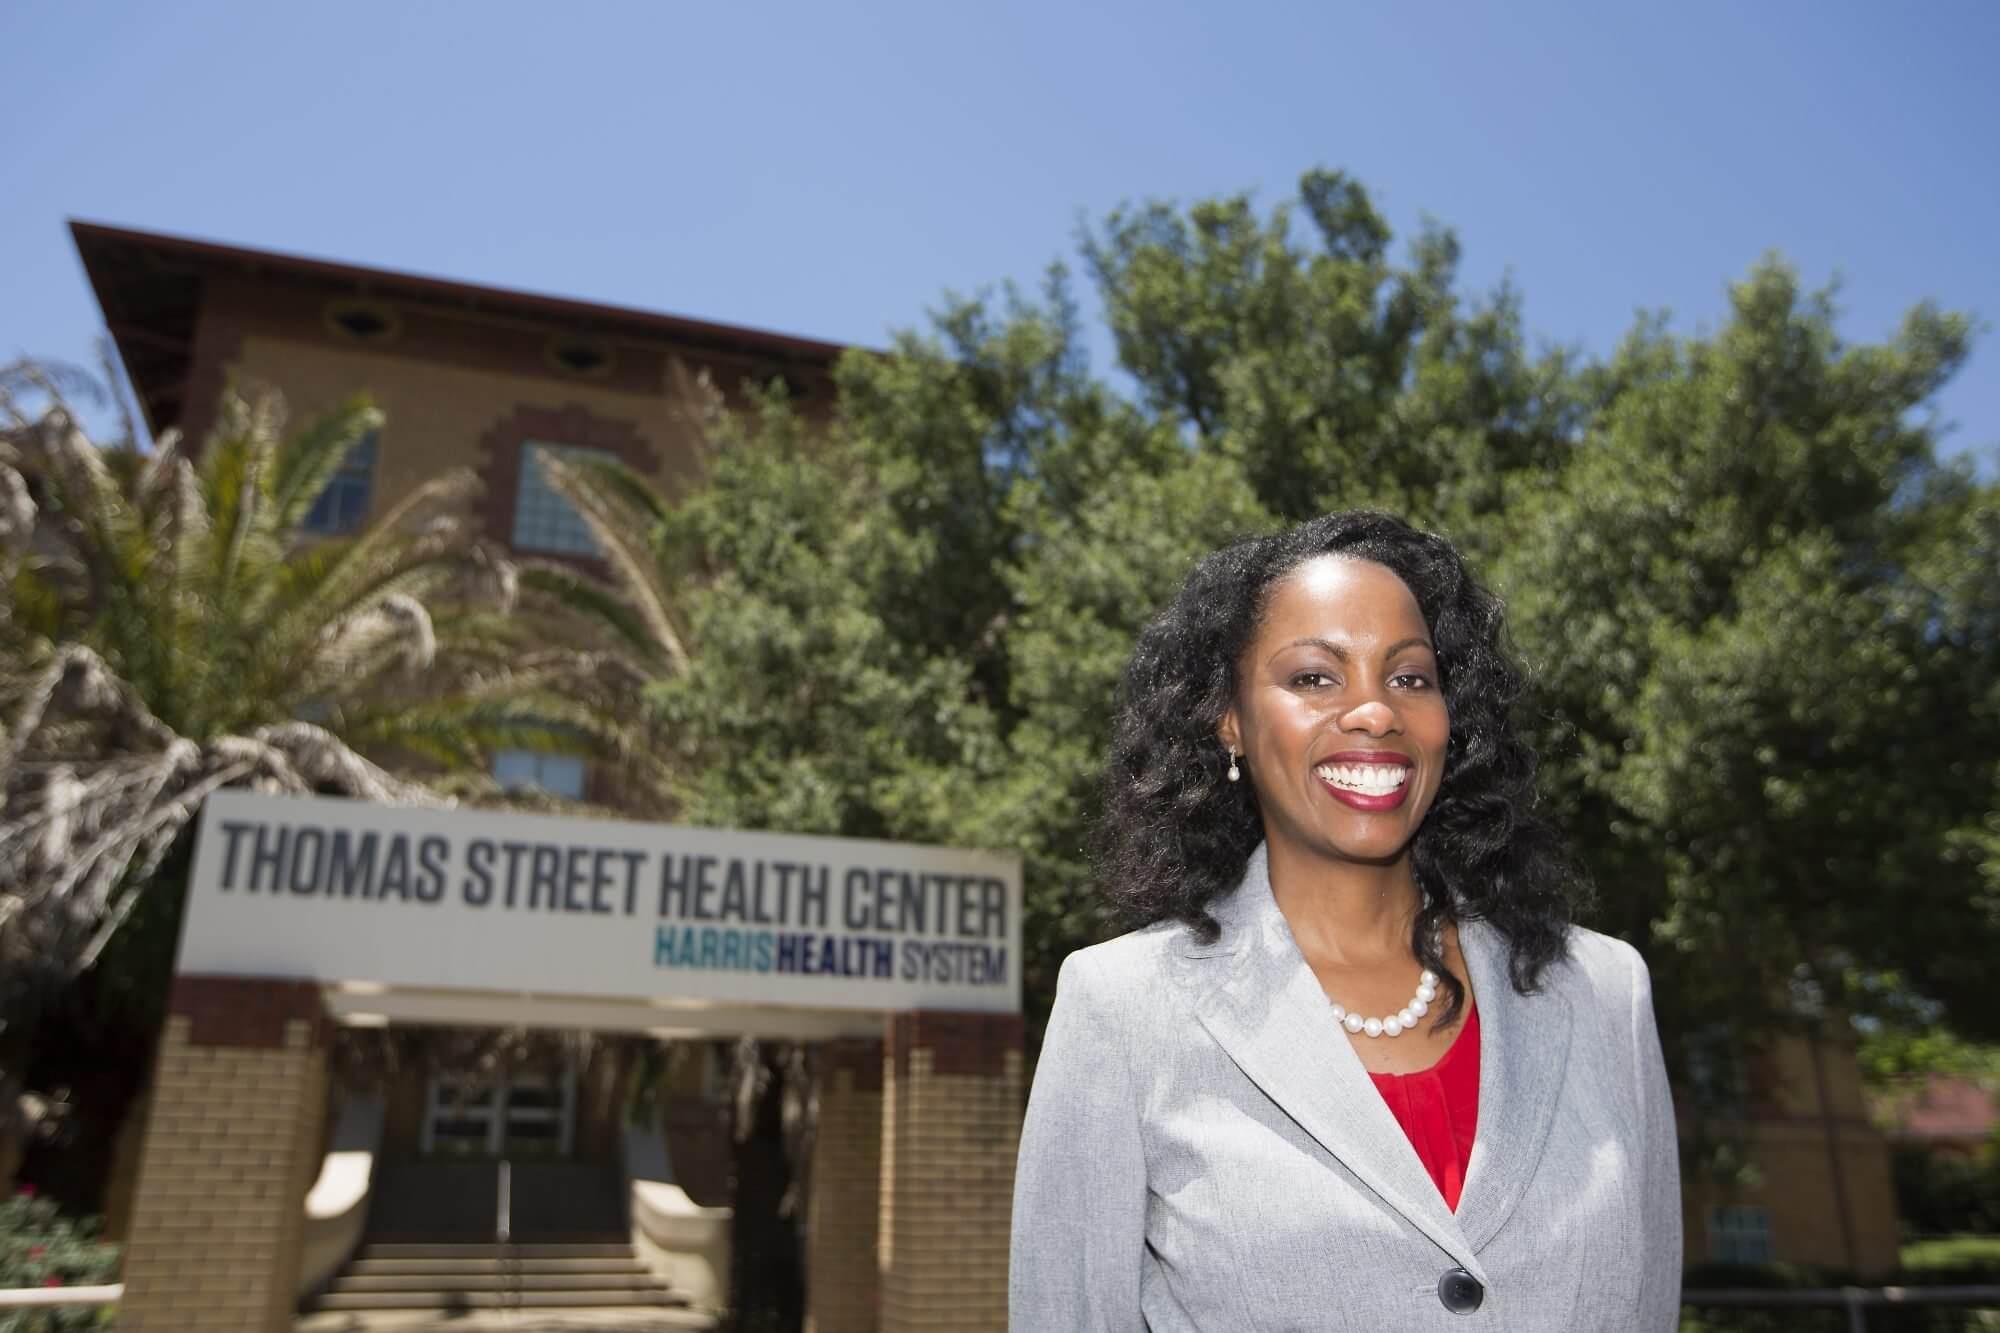 Charlene Flash, M.D., assistant medical director of HIV services for Harris Health System and assistant professor at Baylor College of Medicine.